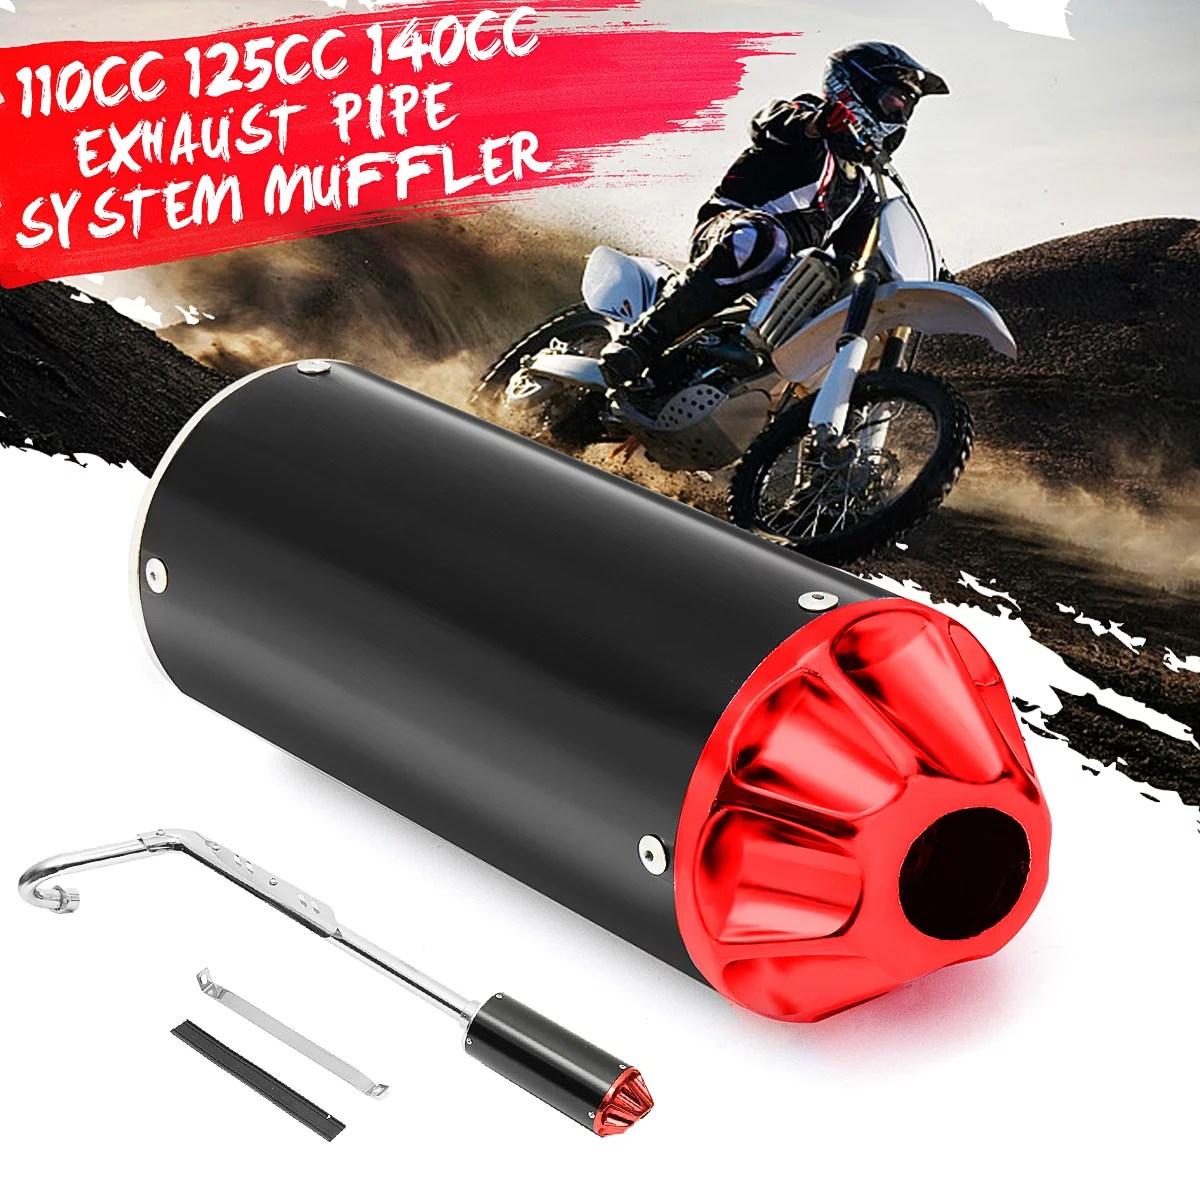 performance cnc exhaust pipe system muffler kit 110cc 125cc 140cc pit dirt bike walmart com